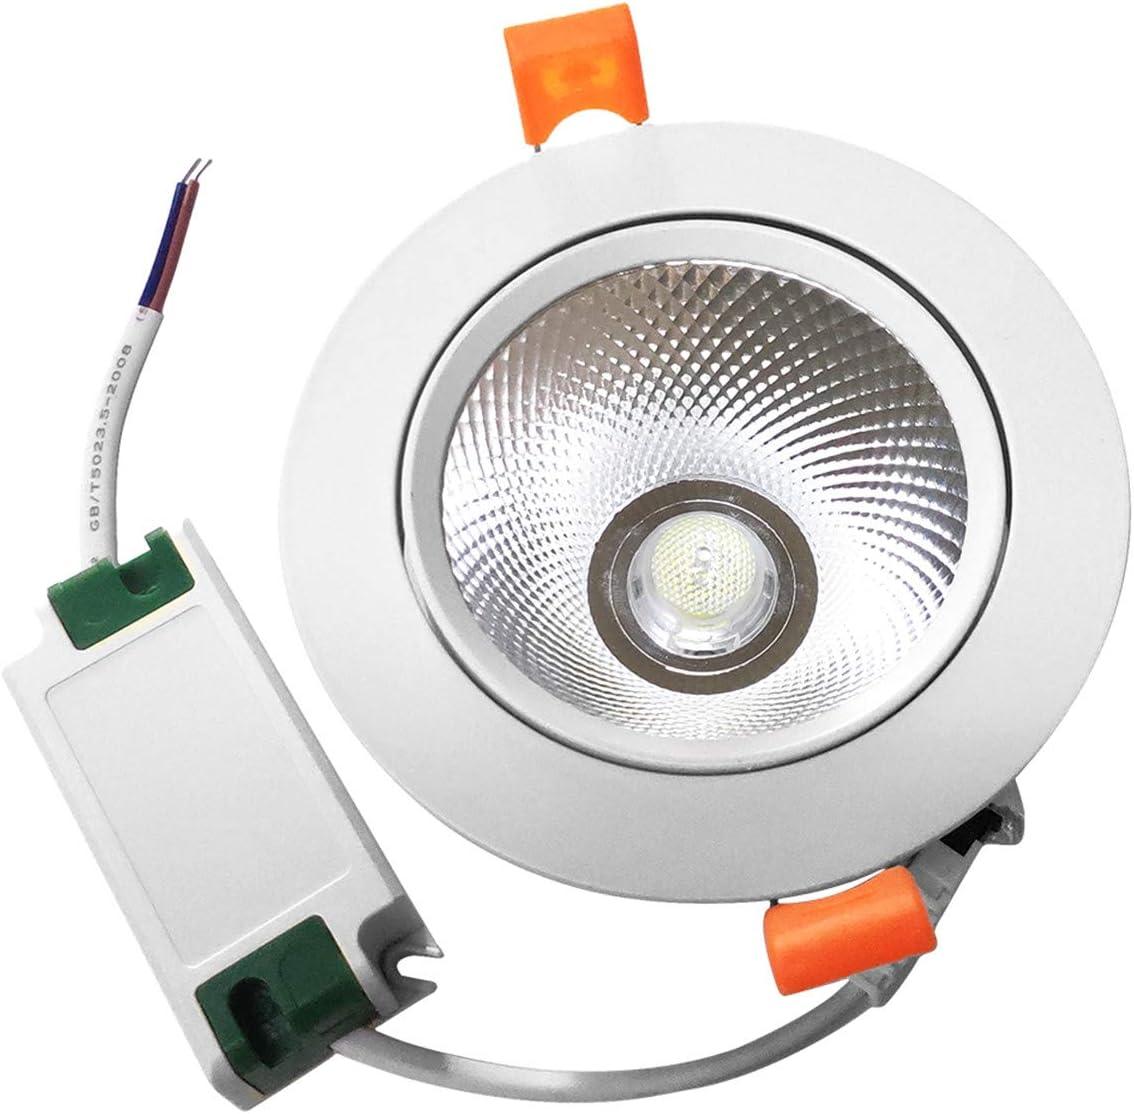 85-262V for Home 15W COB LED Spotlight 6000K 1425LM Cold White Pocketman 10 Pack Recessed Ceiling Downlight Office Inside Decoration Kitchen